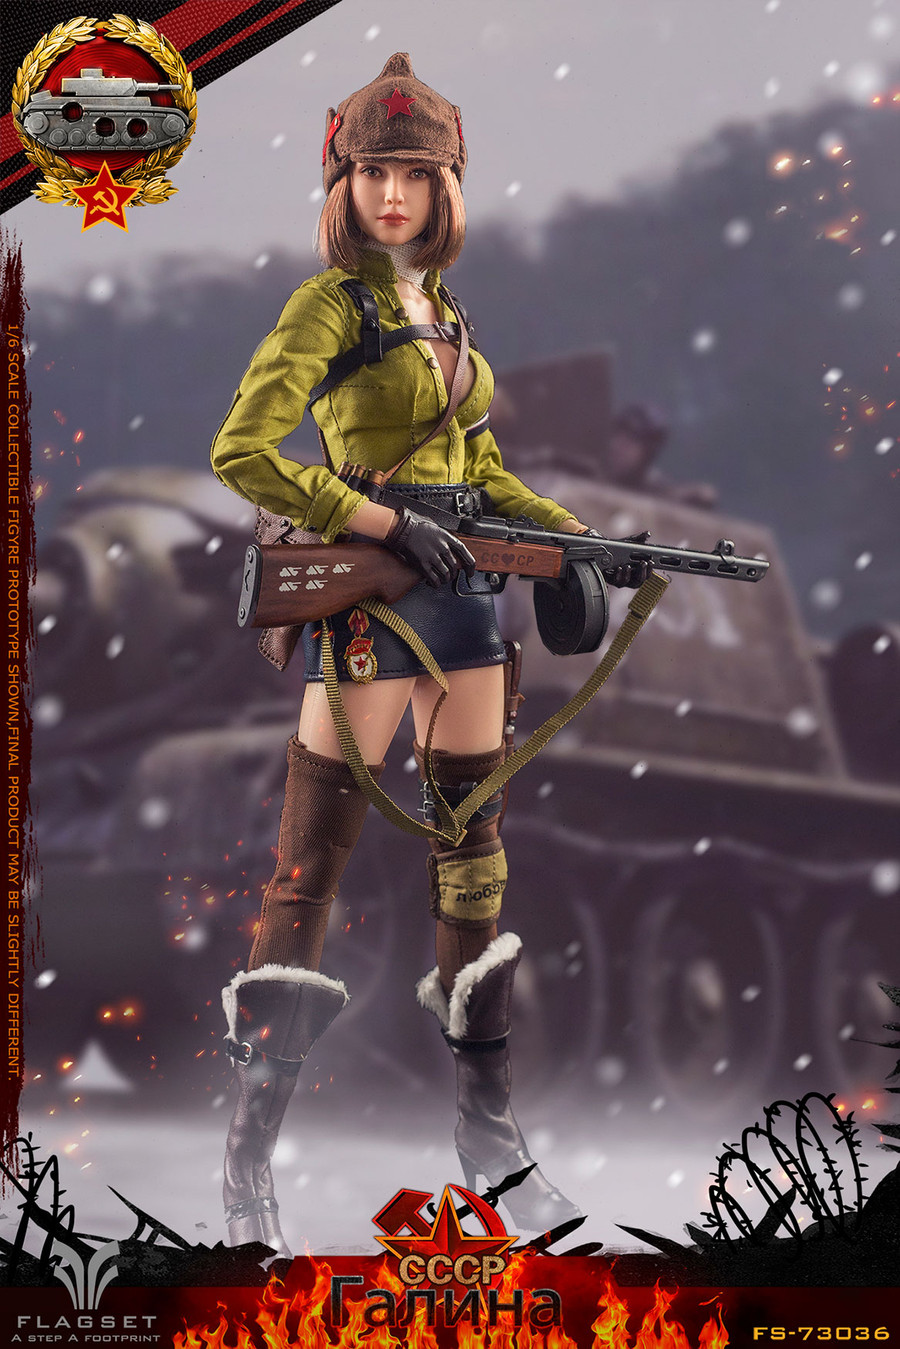 Flagset - Red Alert Soviet Tank Lieutenant Galina